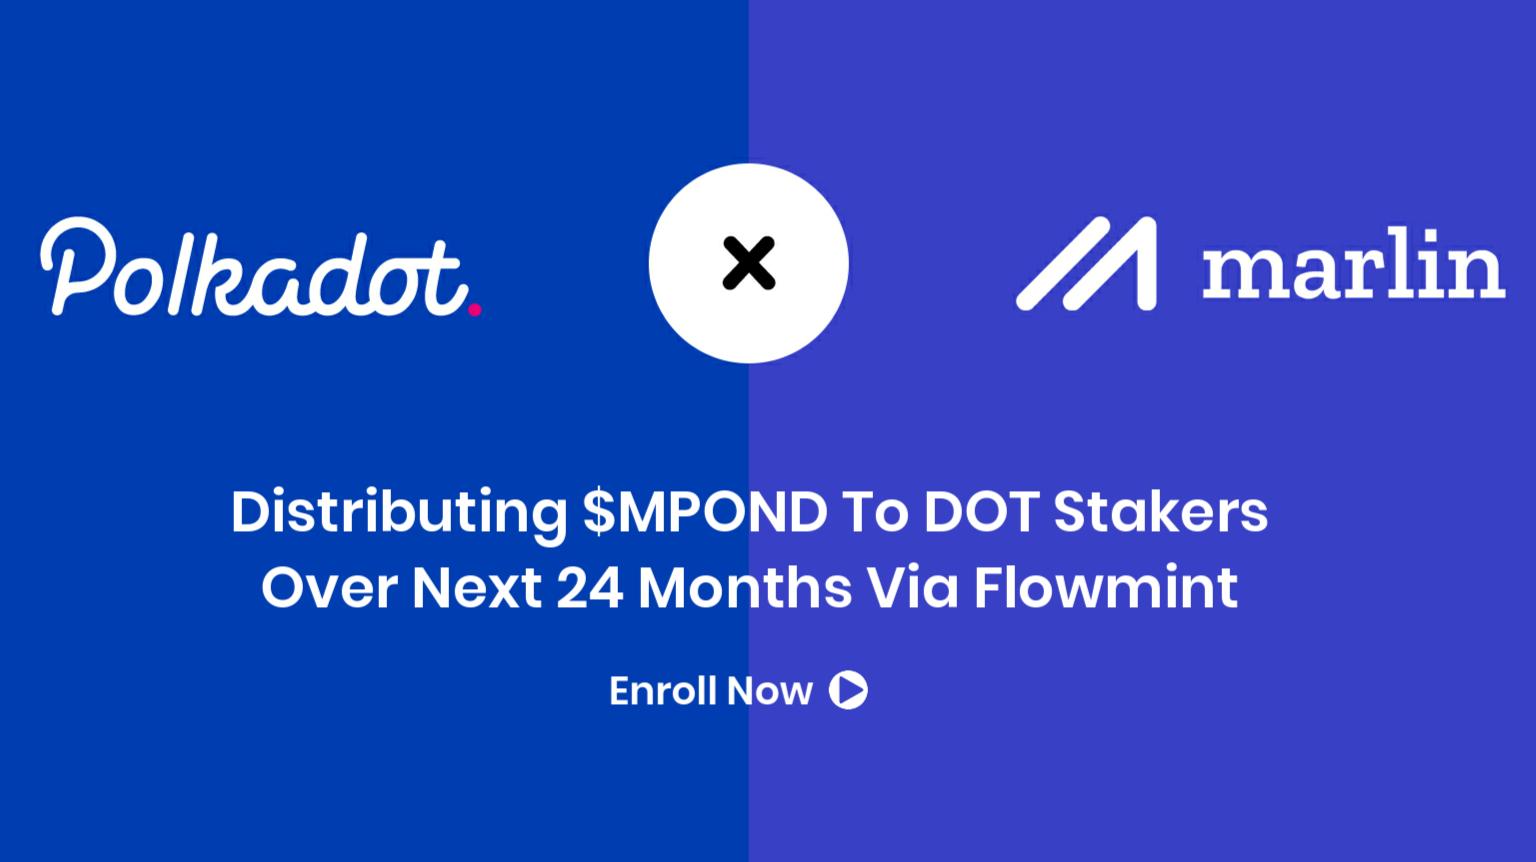 Marlin Flowmint - Distribution of MPOND token to Polkadot DOT Stakers & Validators - Enroll Now - Marlin Protocol - Polkadot Network